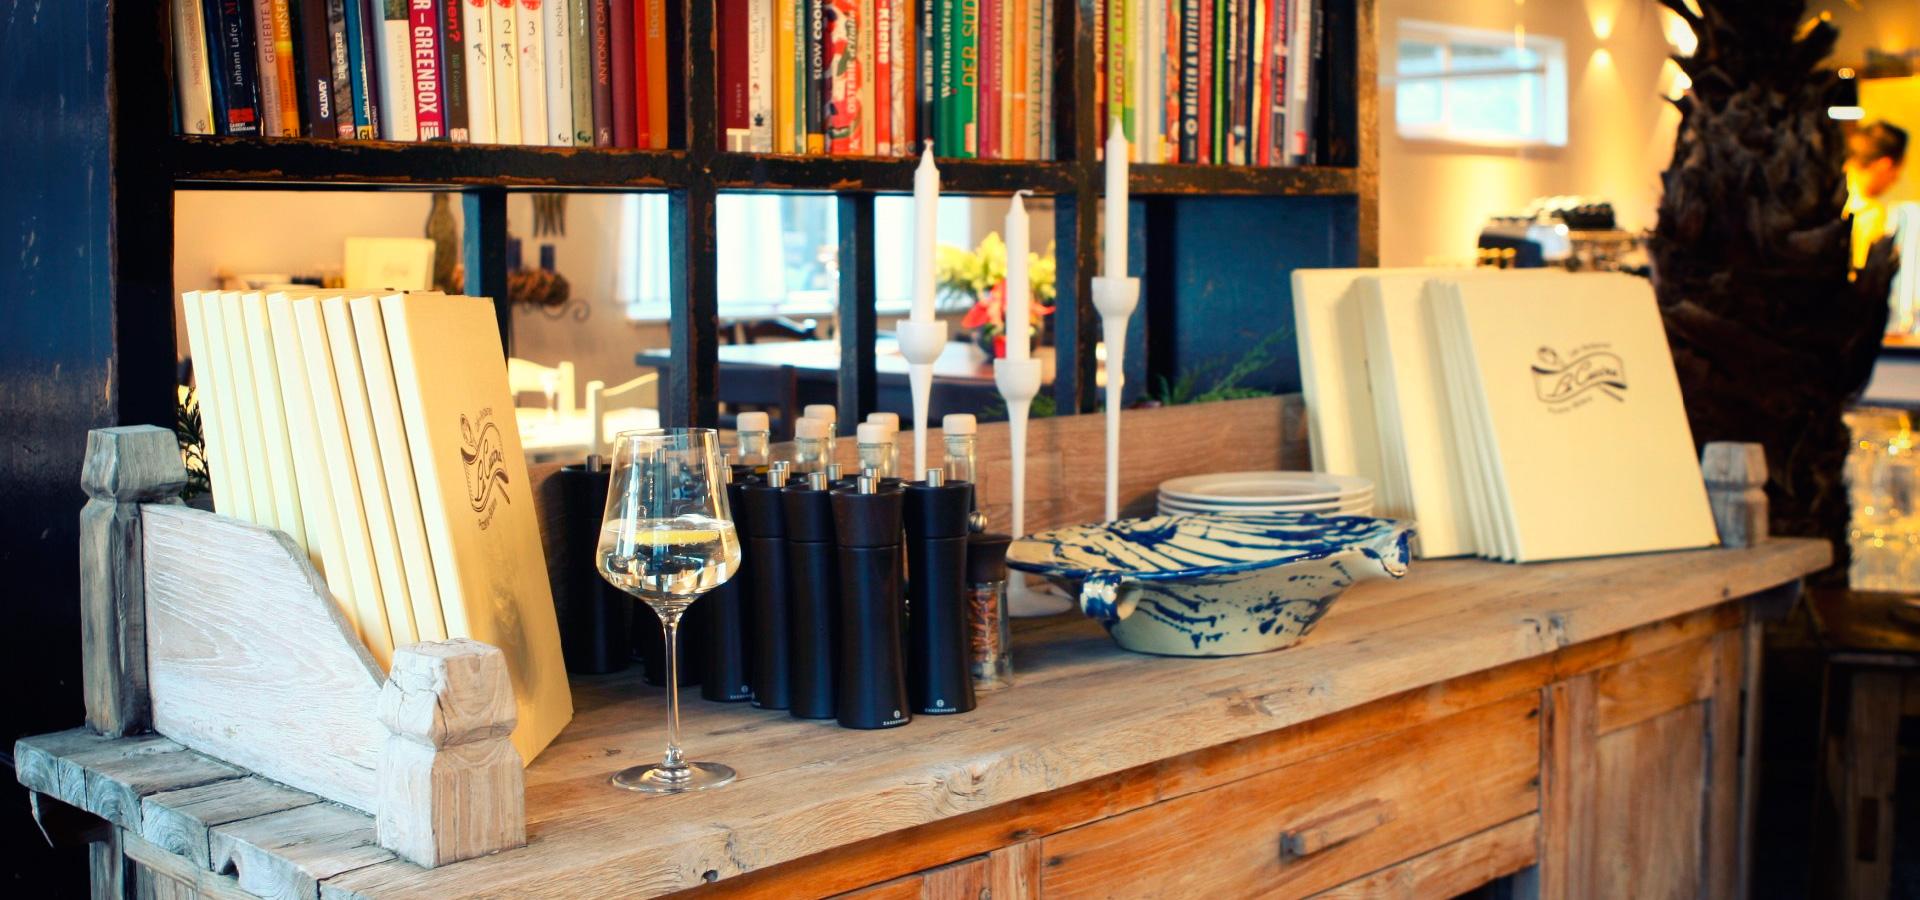 Holzkommode im La Cucina Restaurant